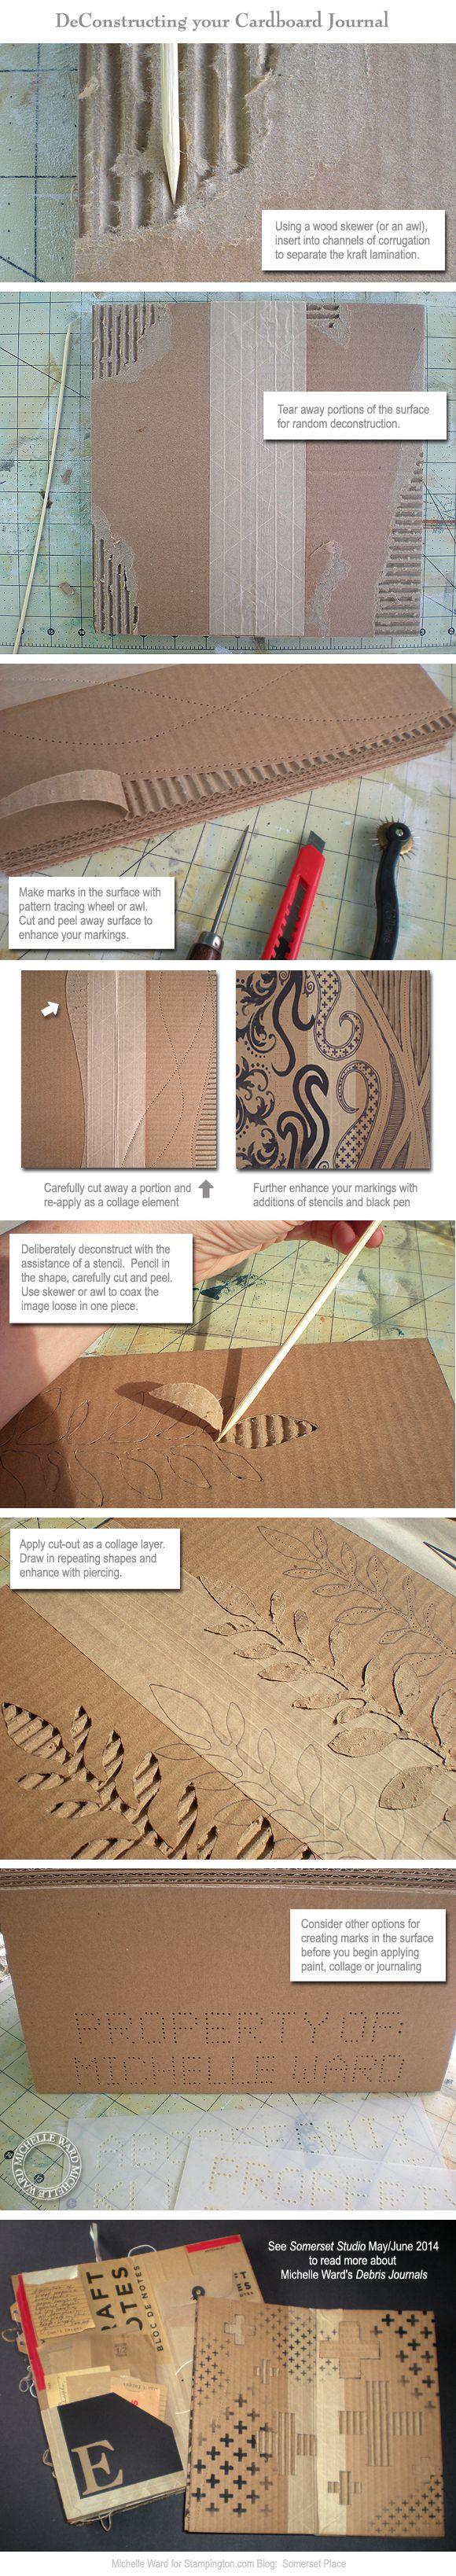 Deconstructing your Cardboard Journal Tutorial. Gloucestershire Resource Centre http://www.grcltd.org/scrapstore/